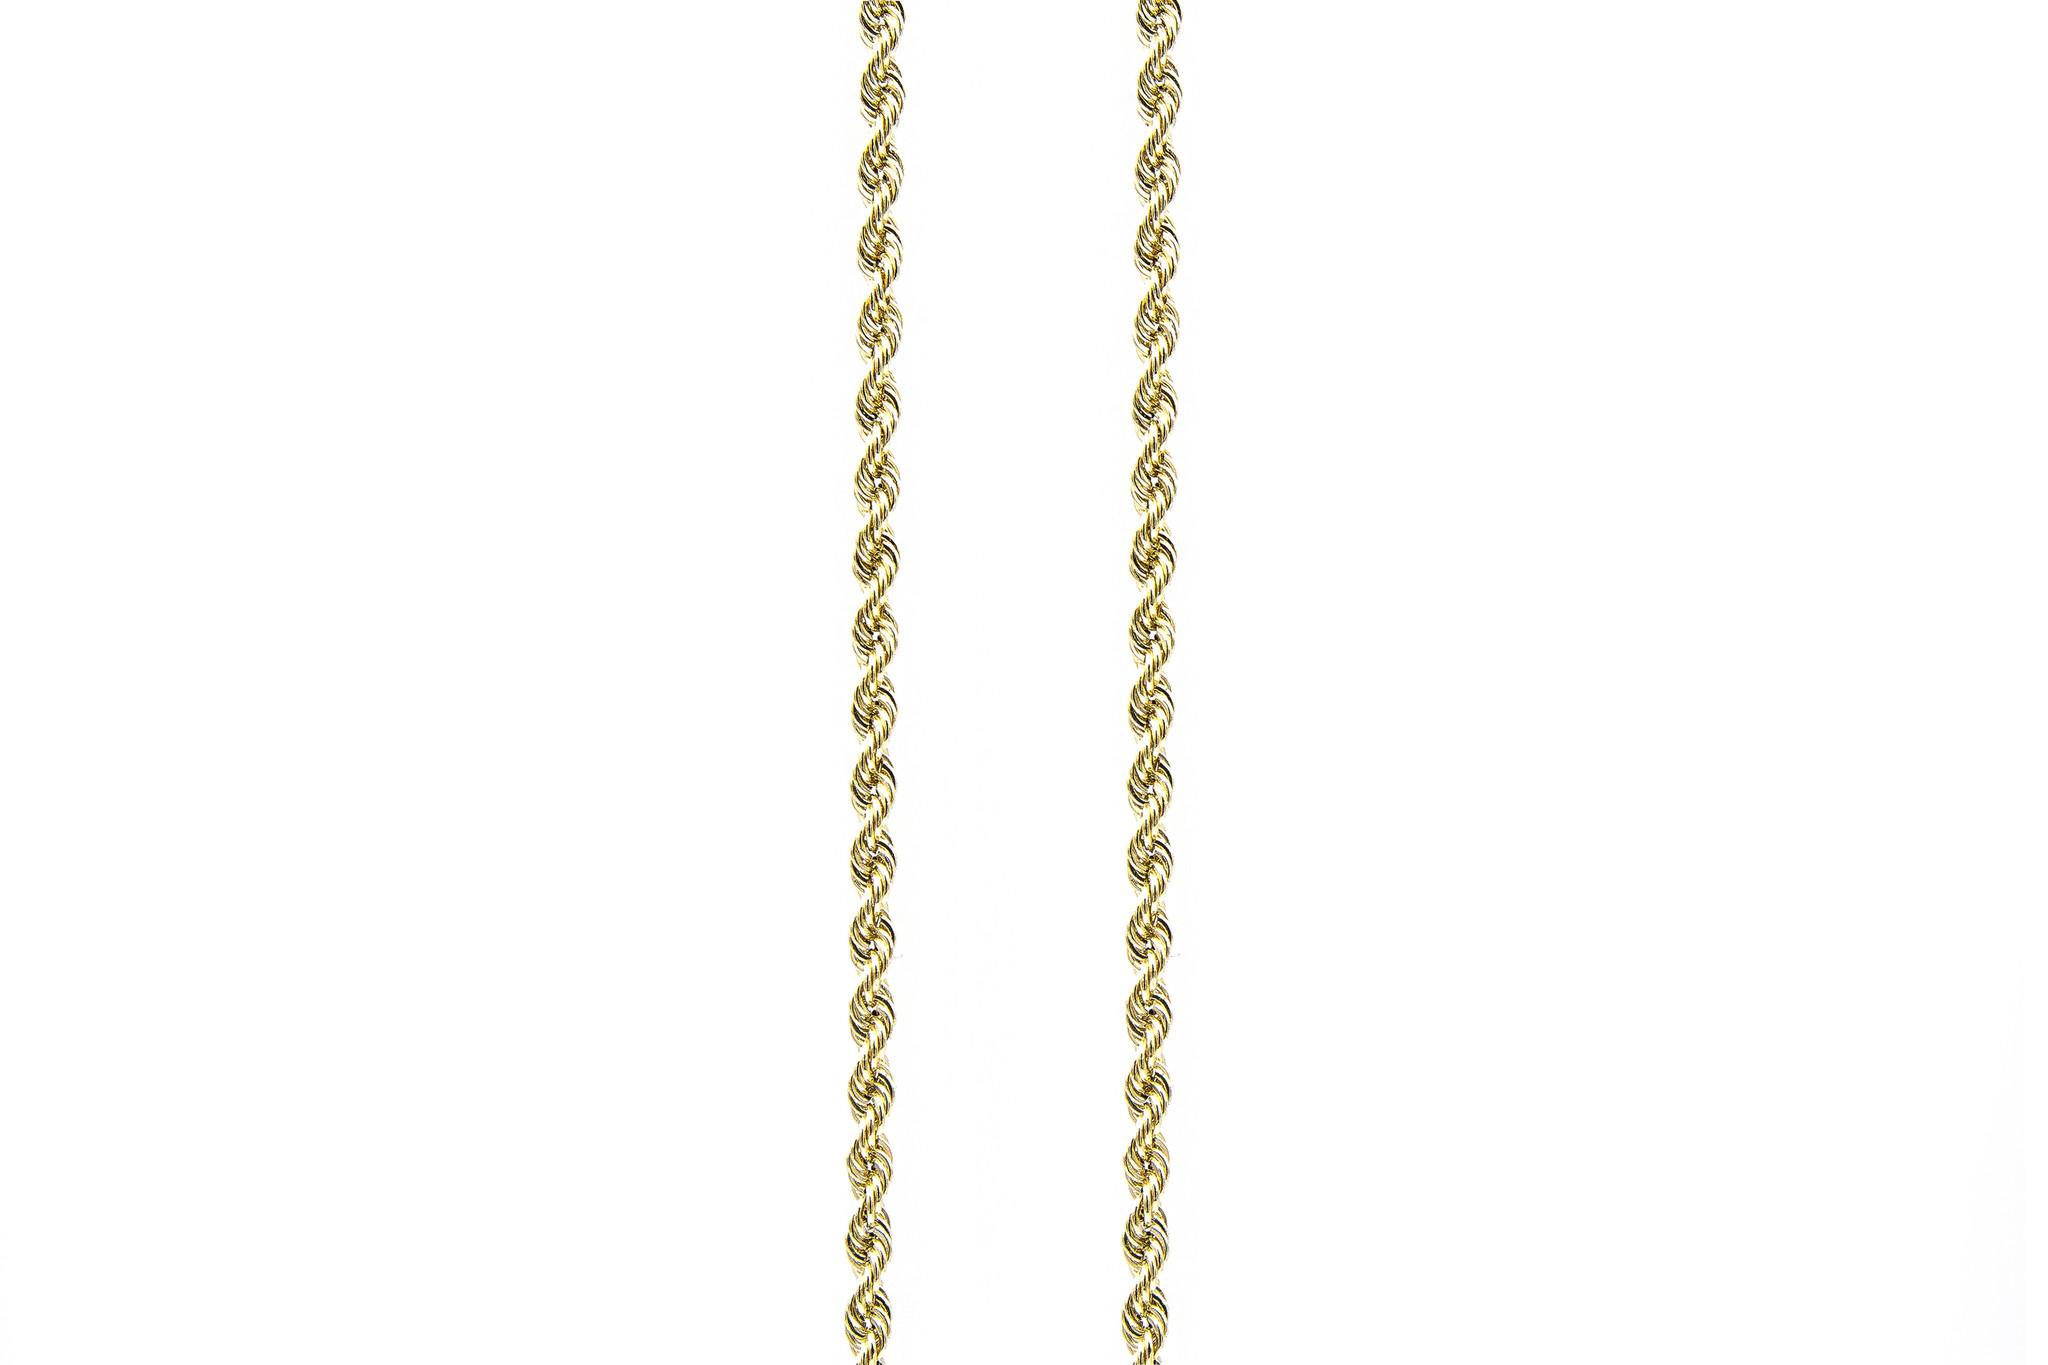 Rope Chain NL 18k-6 mm-1